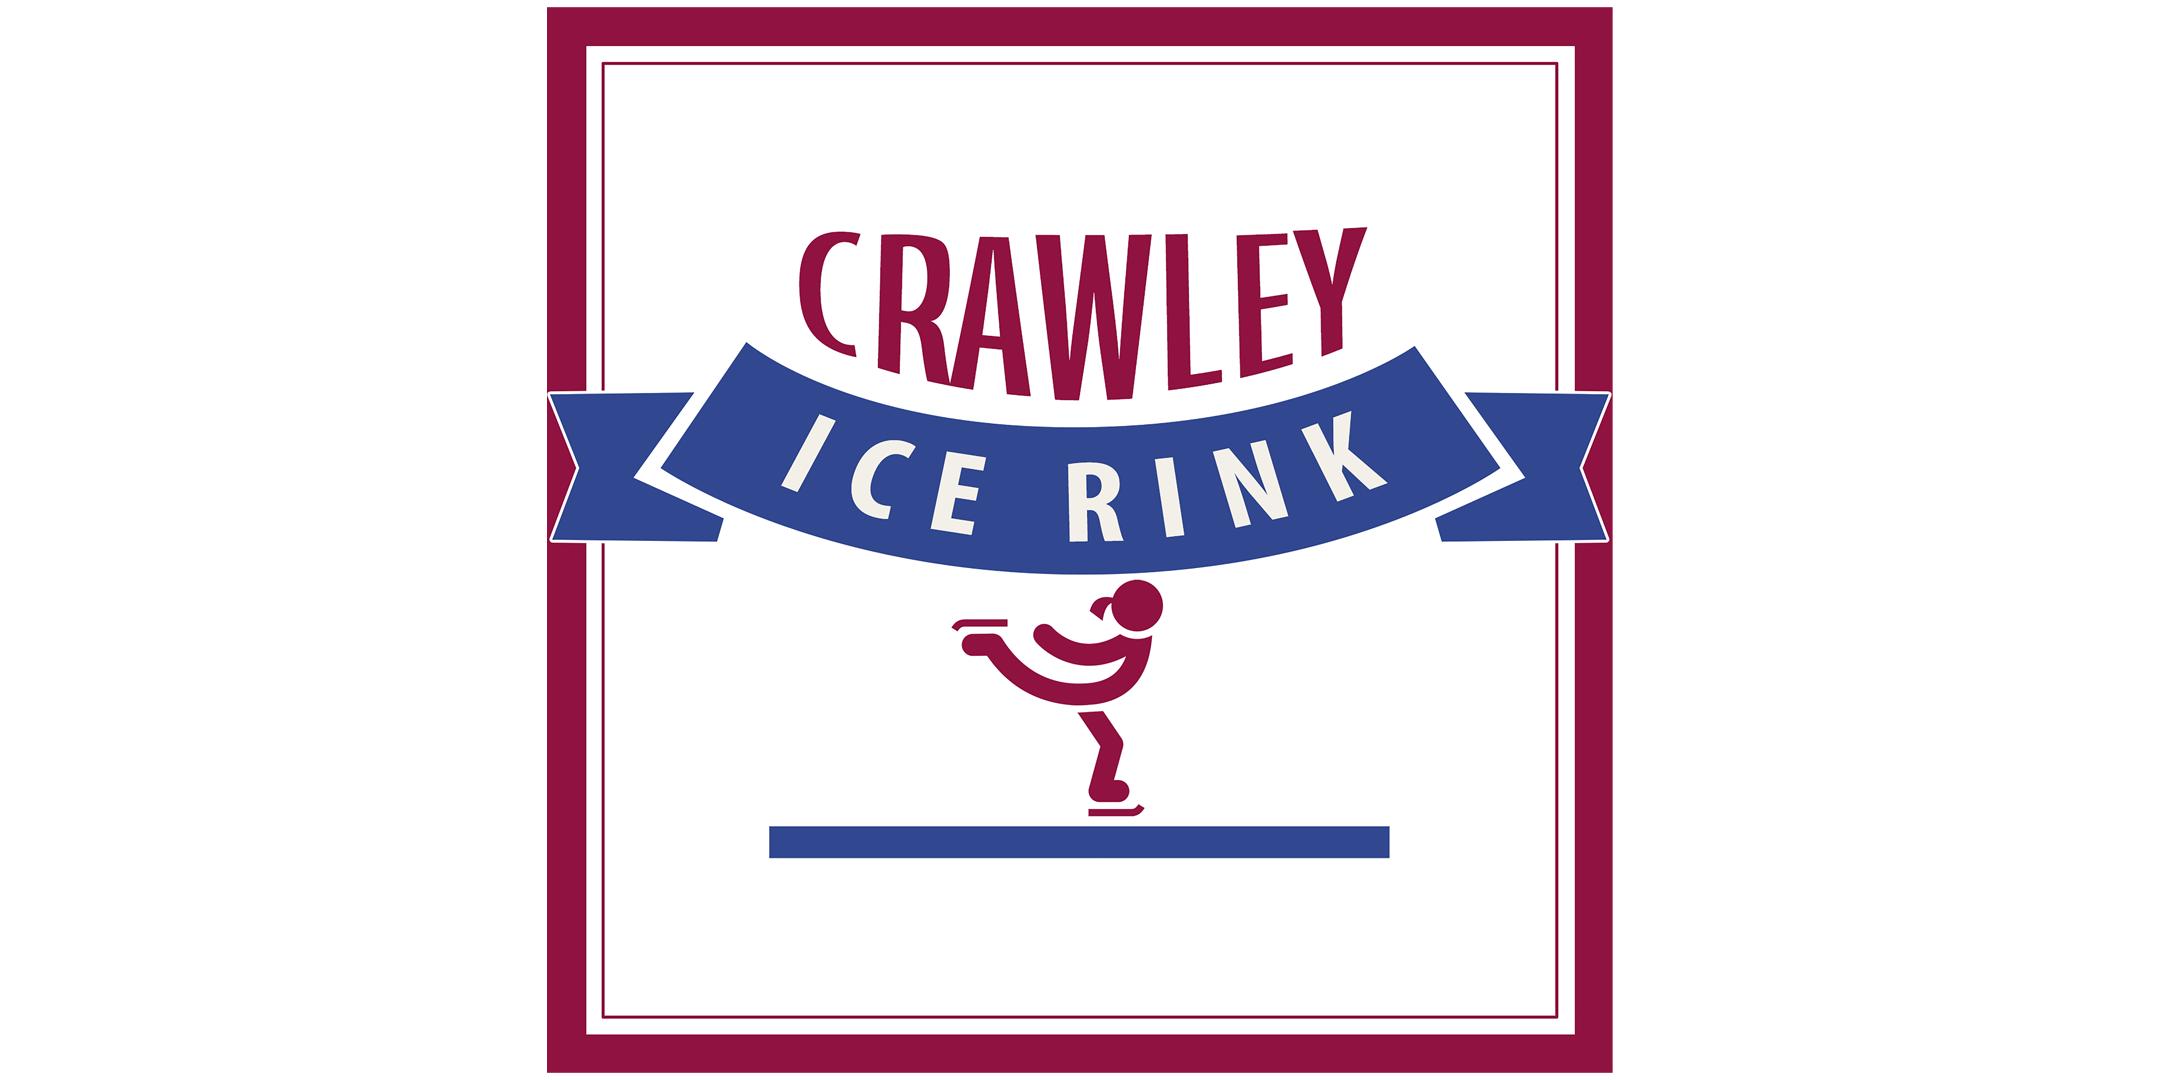 Crawley Ice Rink - 28th November (Off Peak)